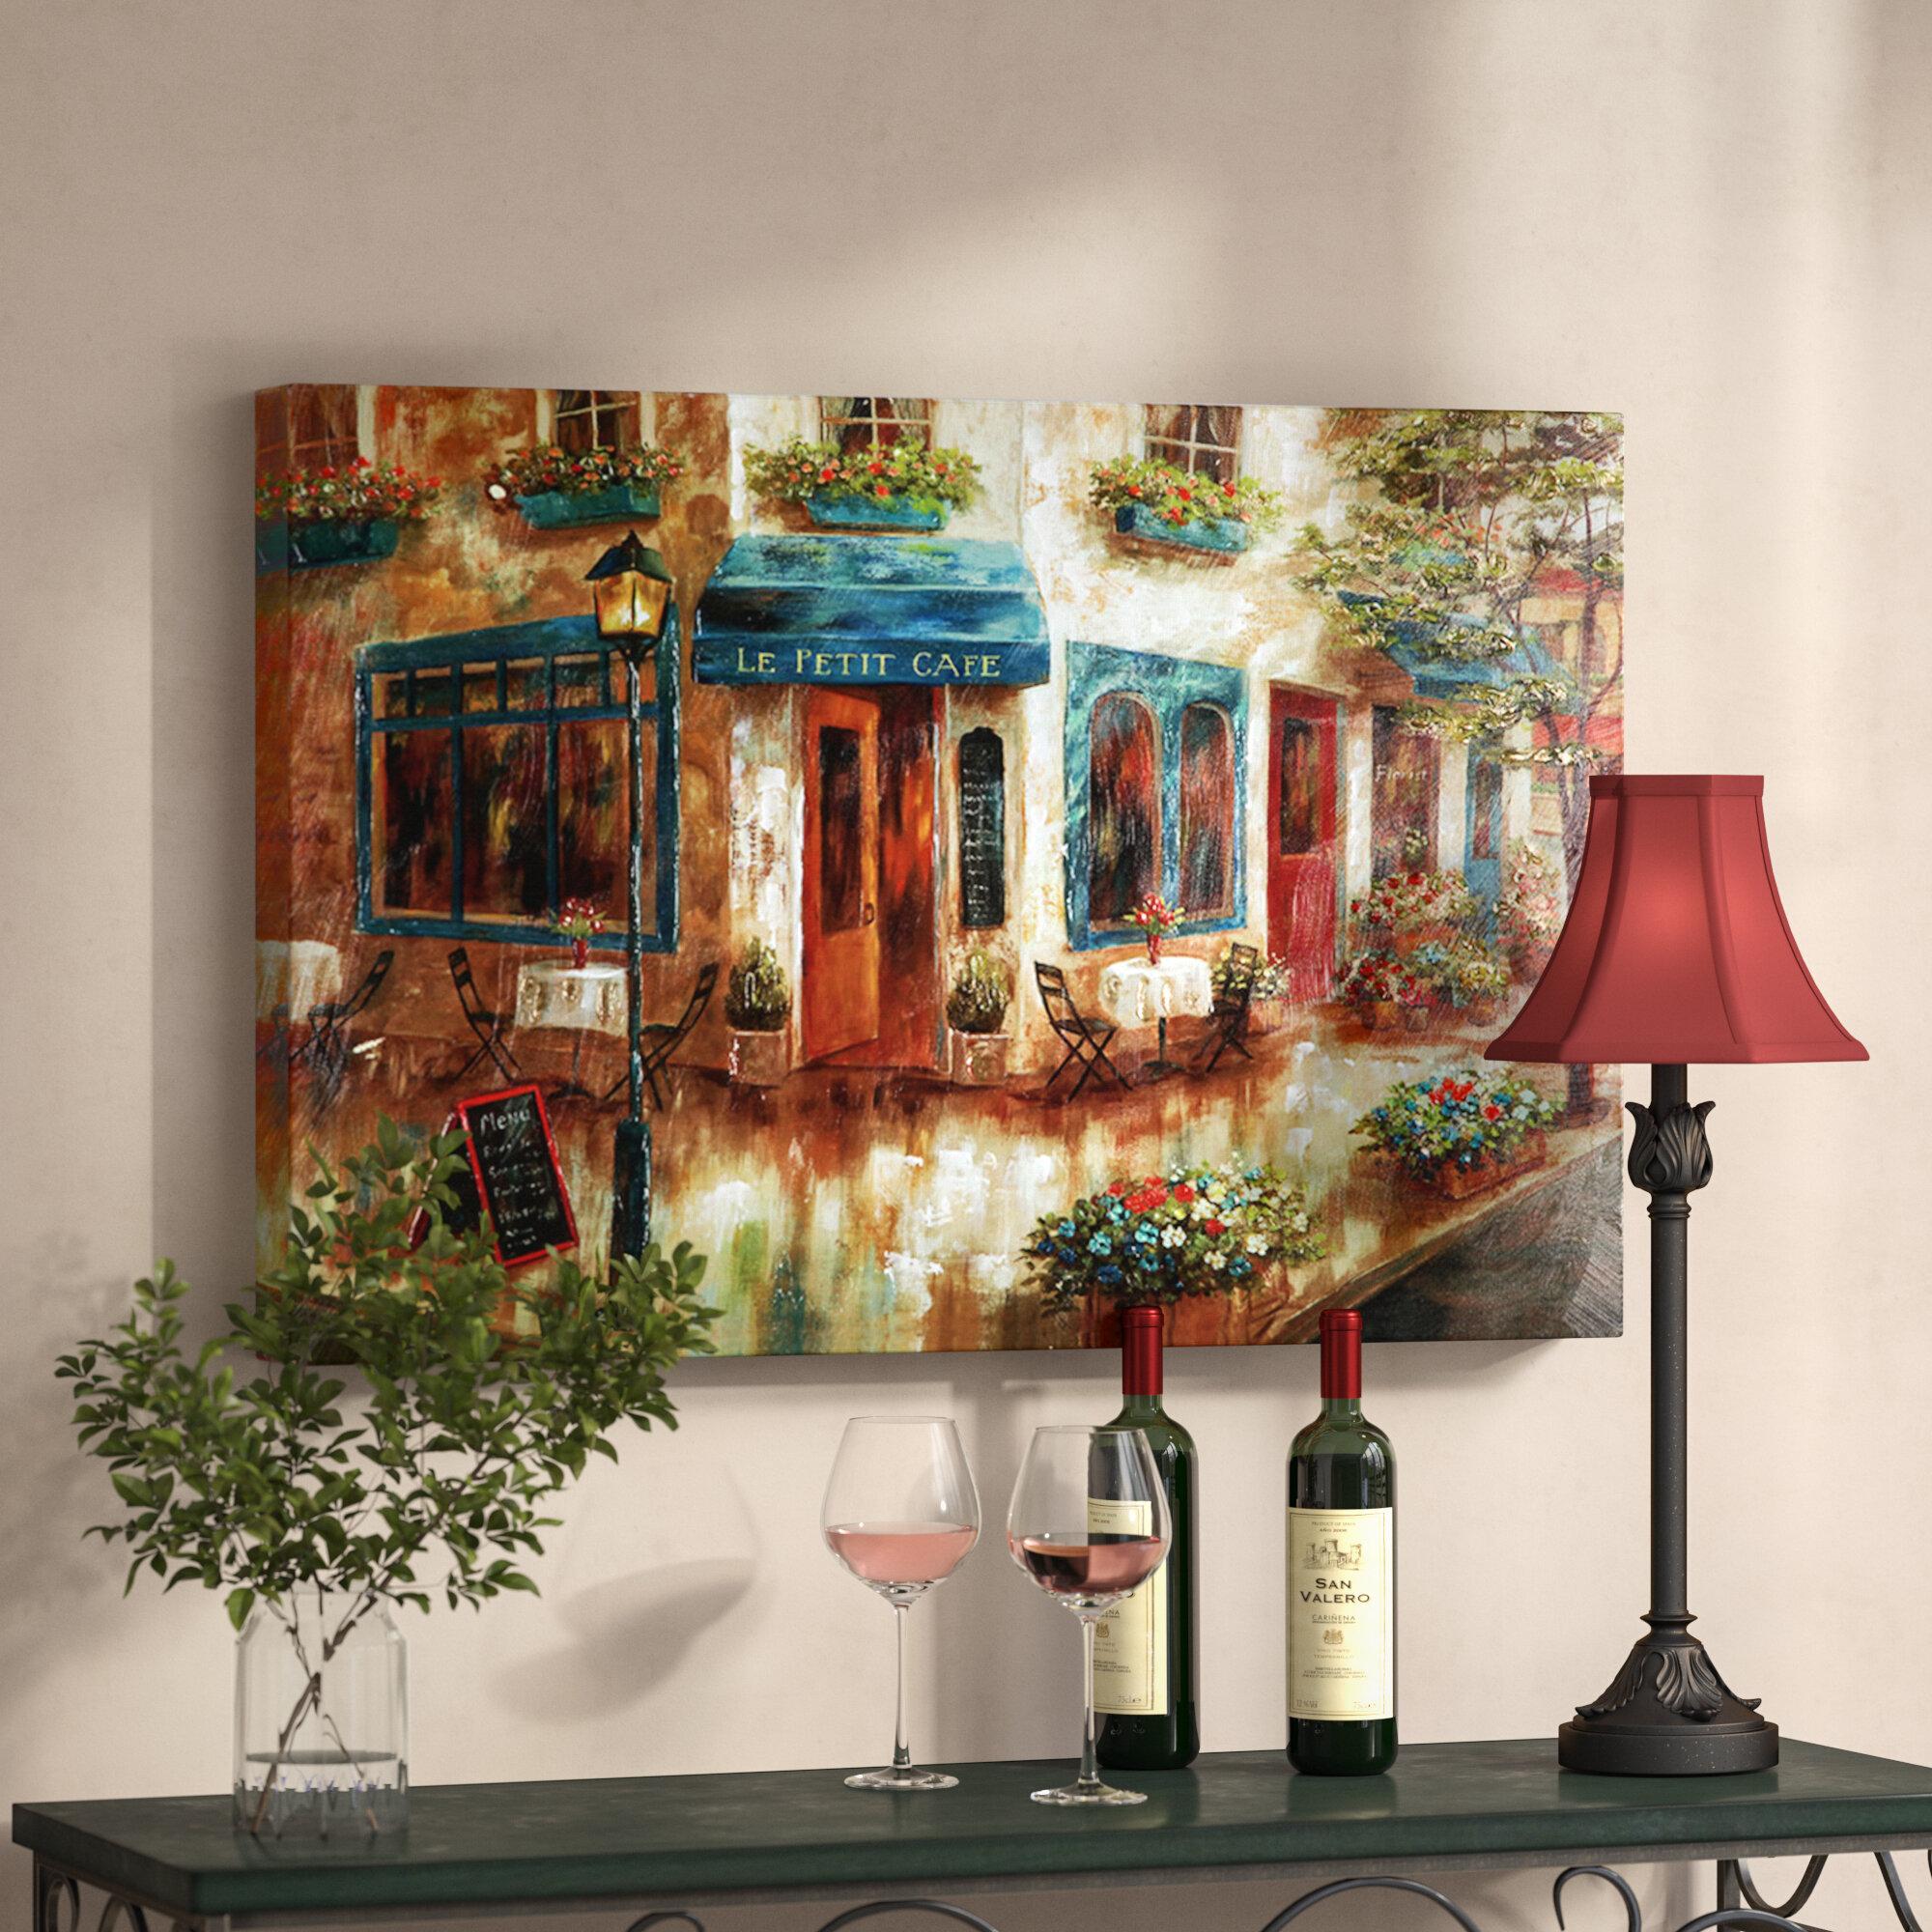 Champagne Flute Rustic Kitchen Distressed Stripes by Milli Villa - Graphic  Art Print